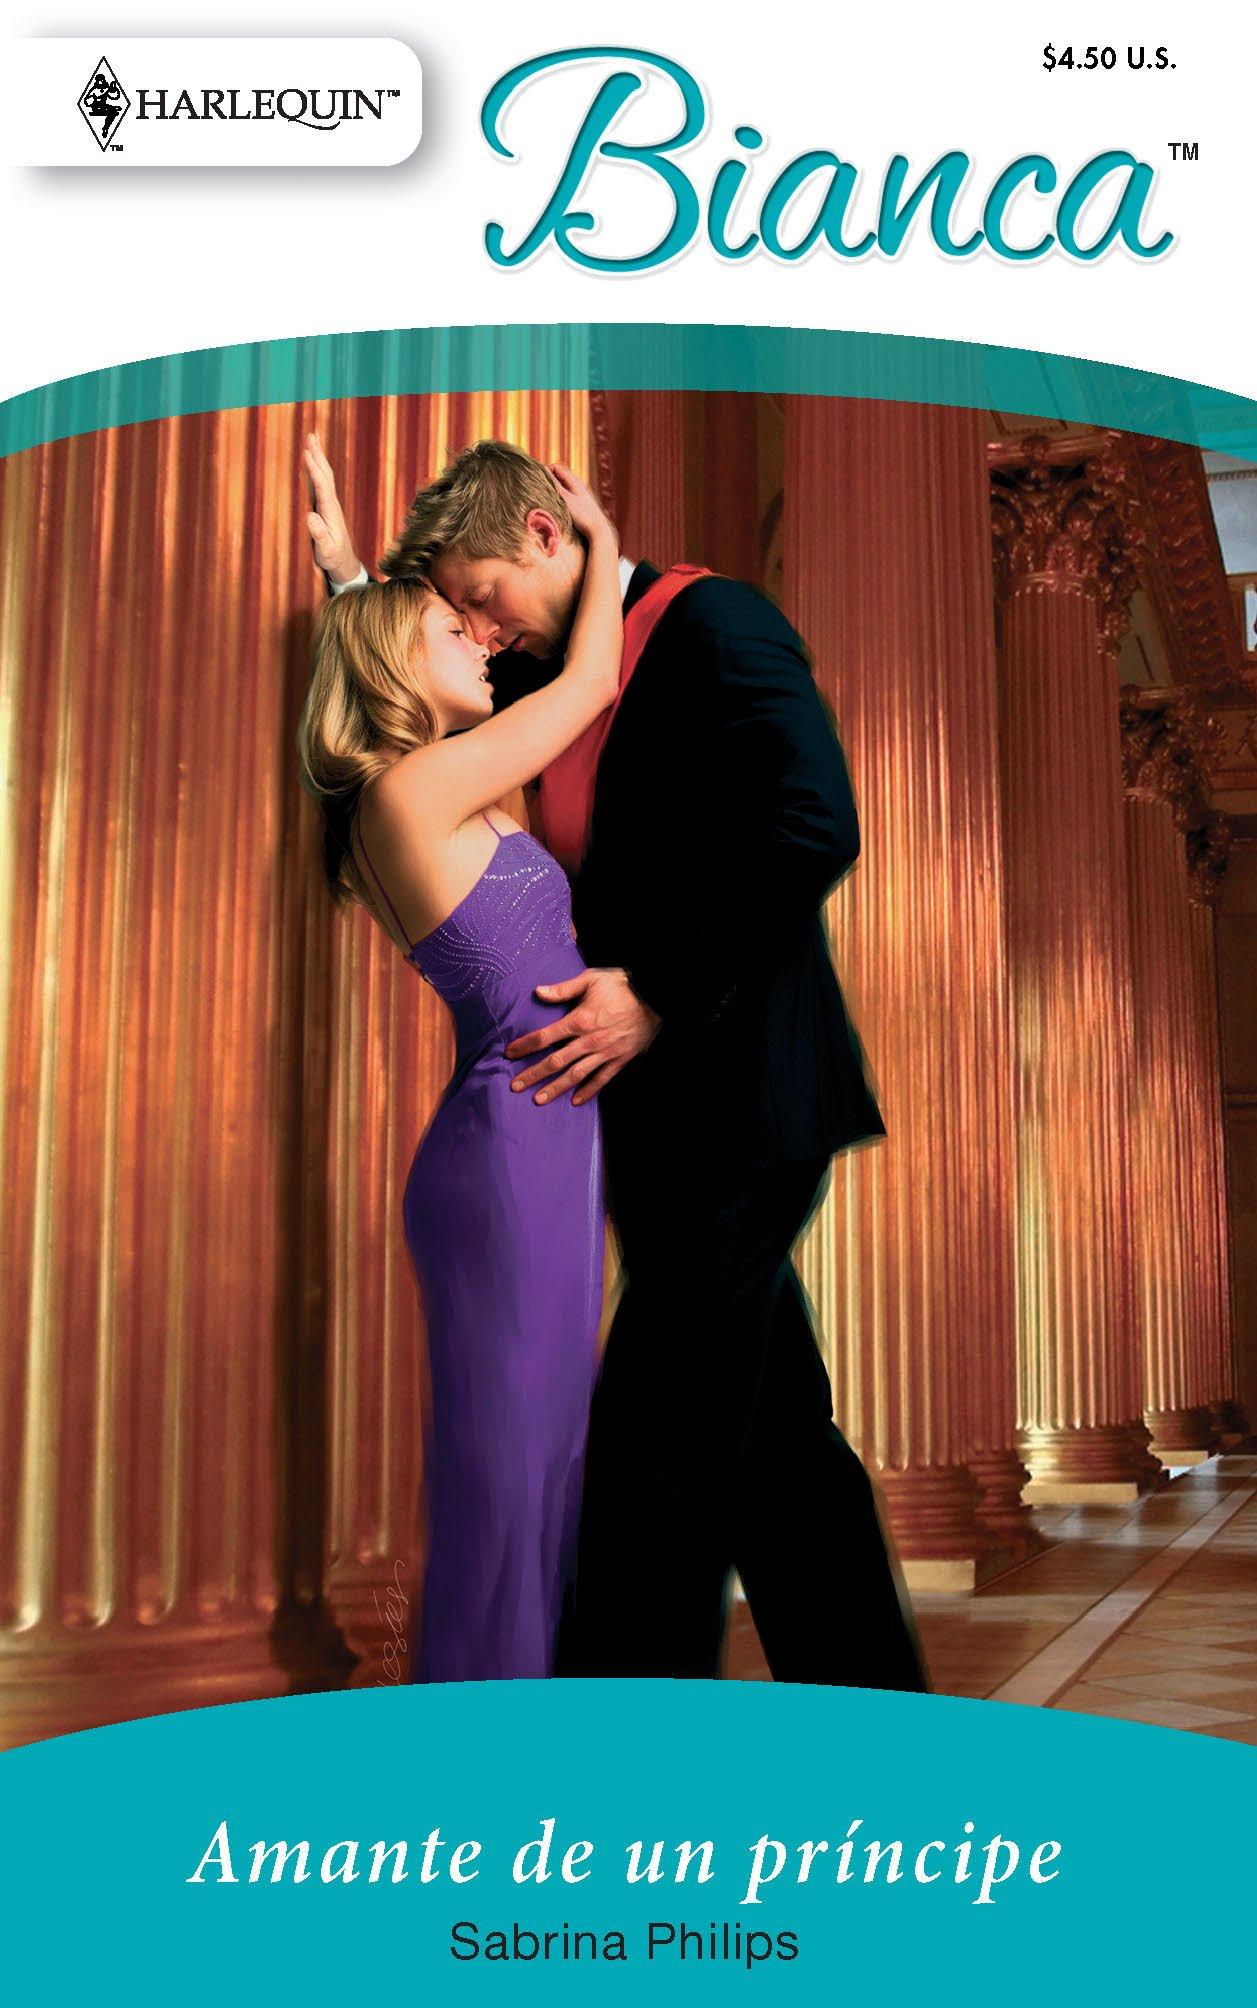 Amante De Un Principe: (Lover of a Prince) (Harlequin Bianca) (Spanish Edition) pdf